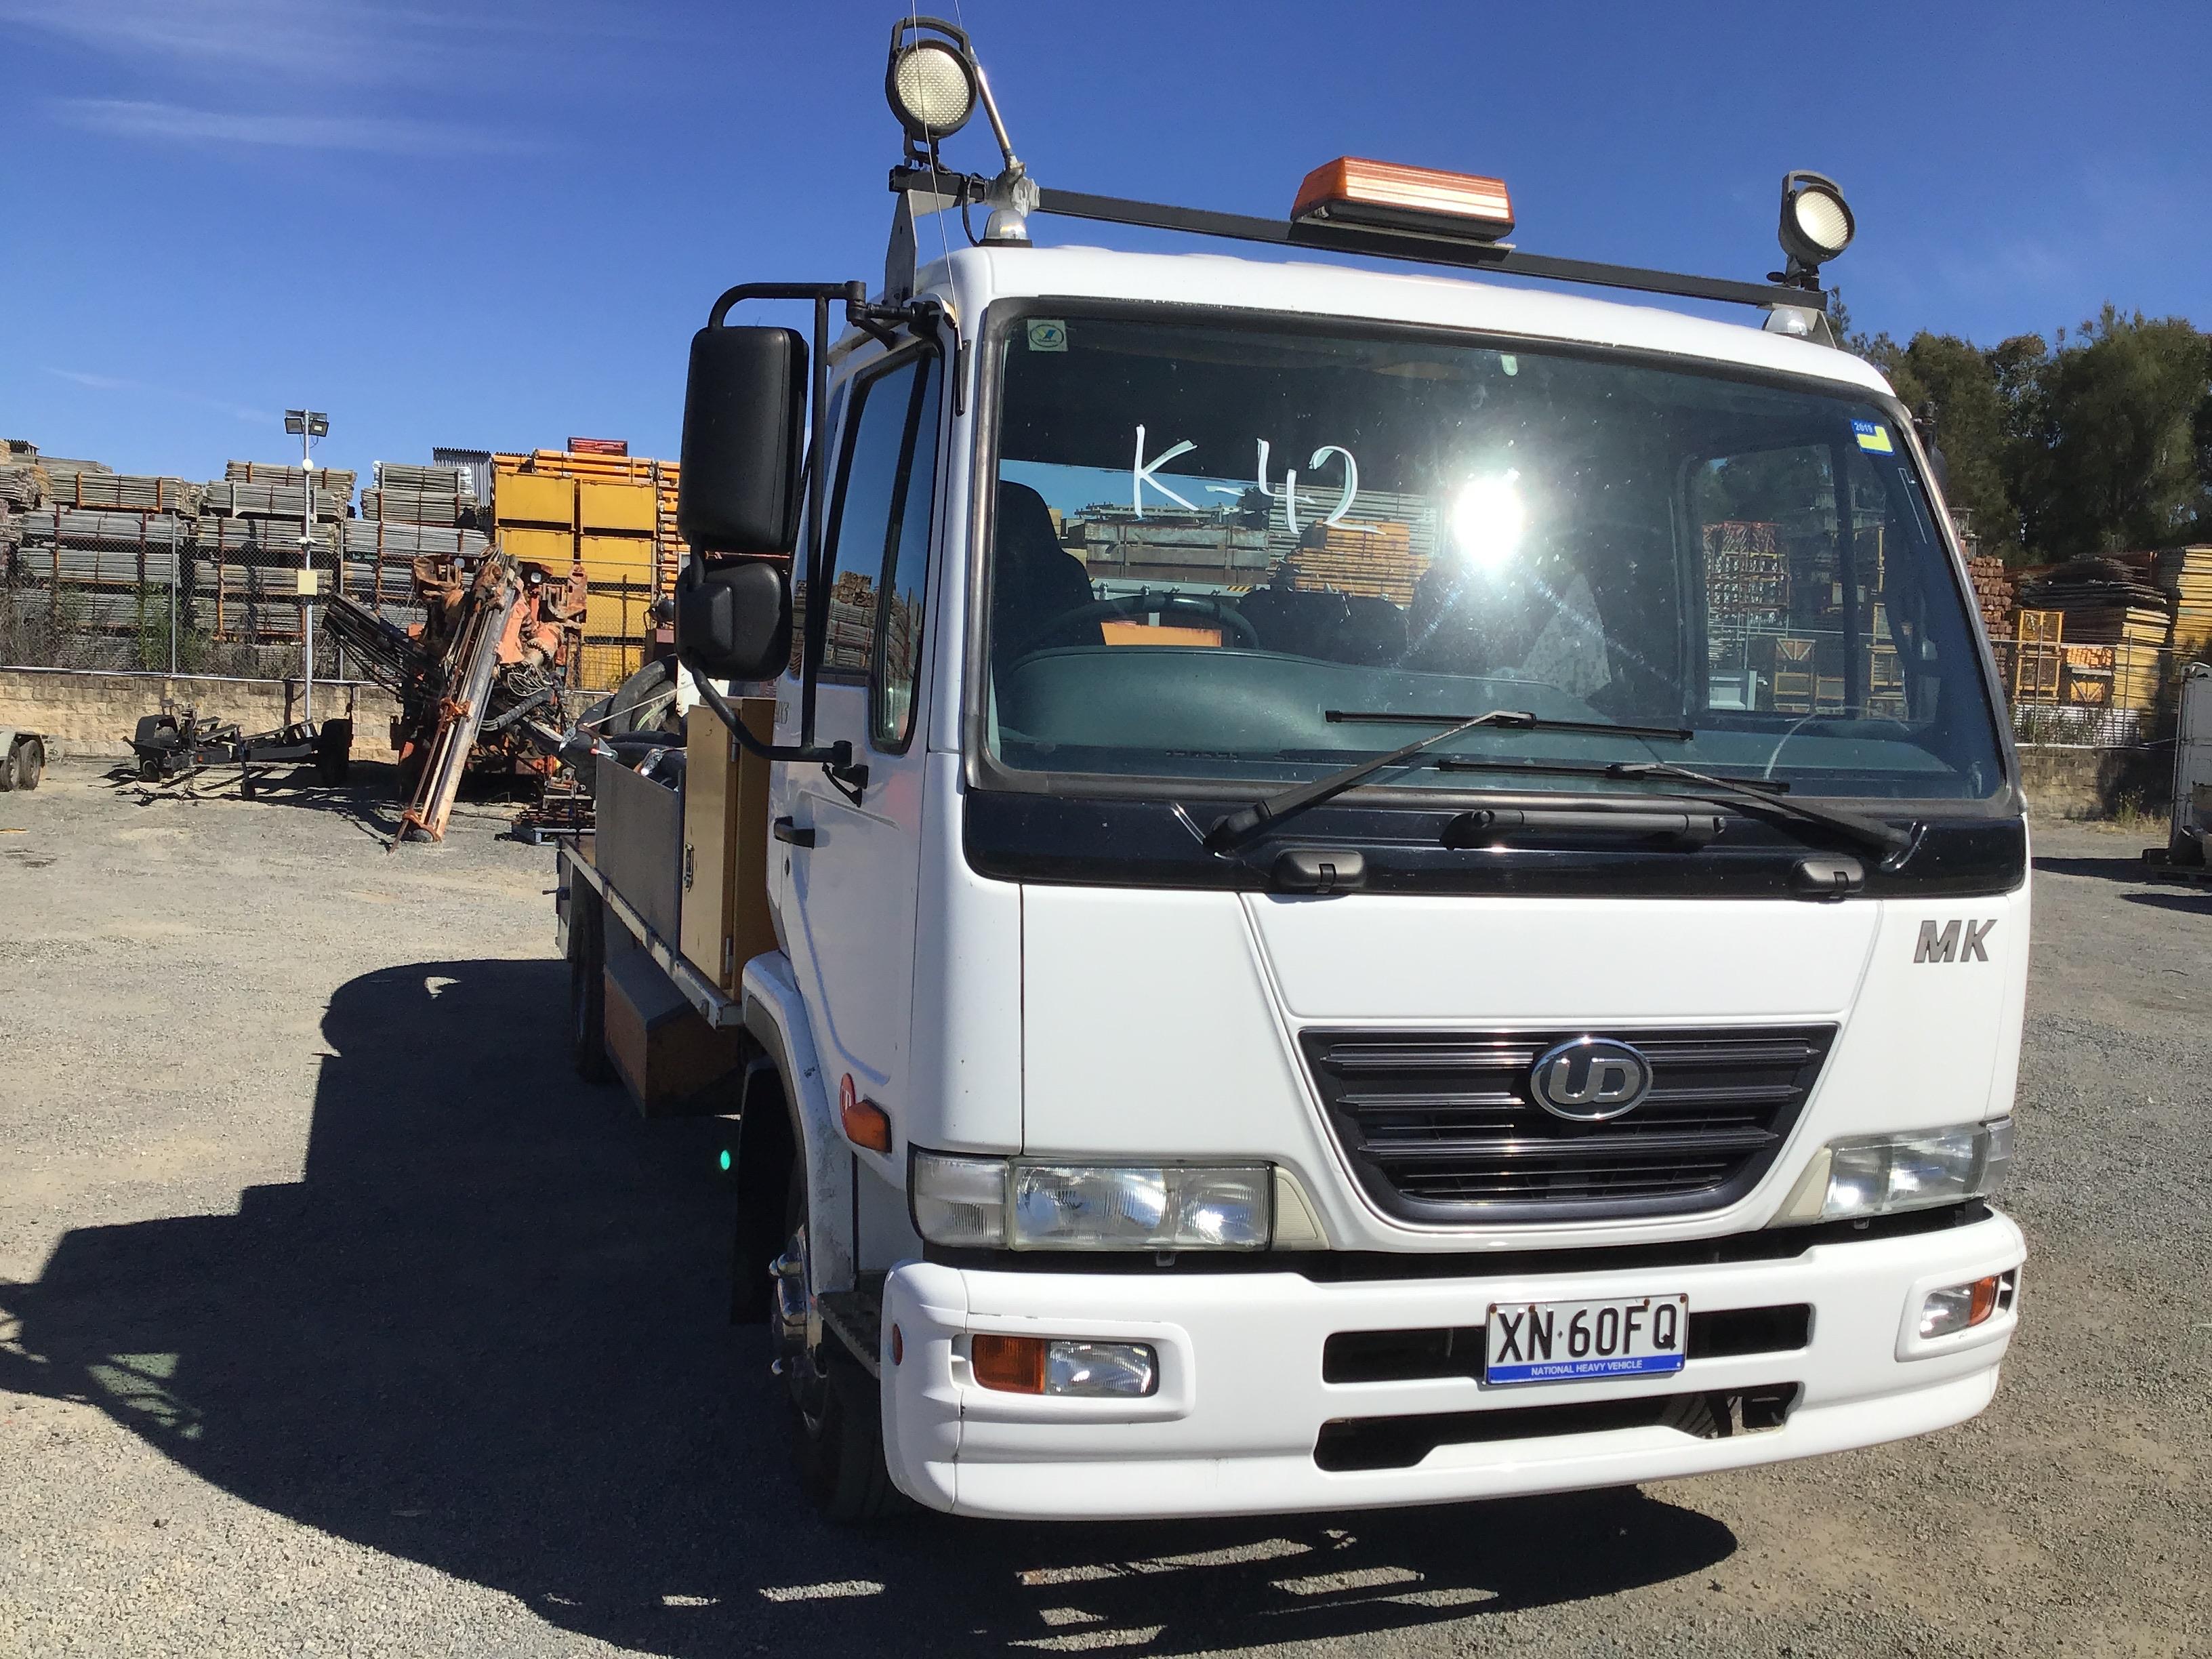 2010 NISSAN UD MK5 Manual Concrete Pump Truck